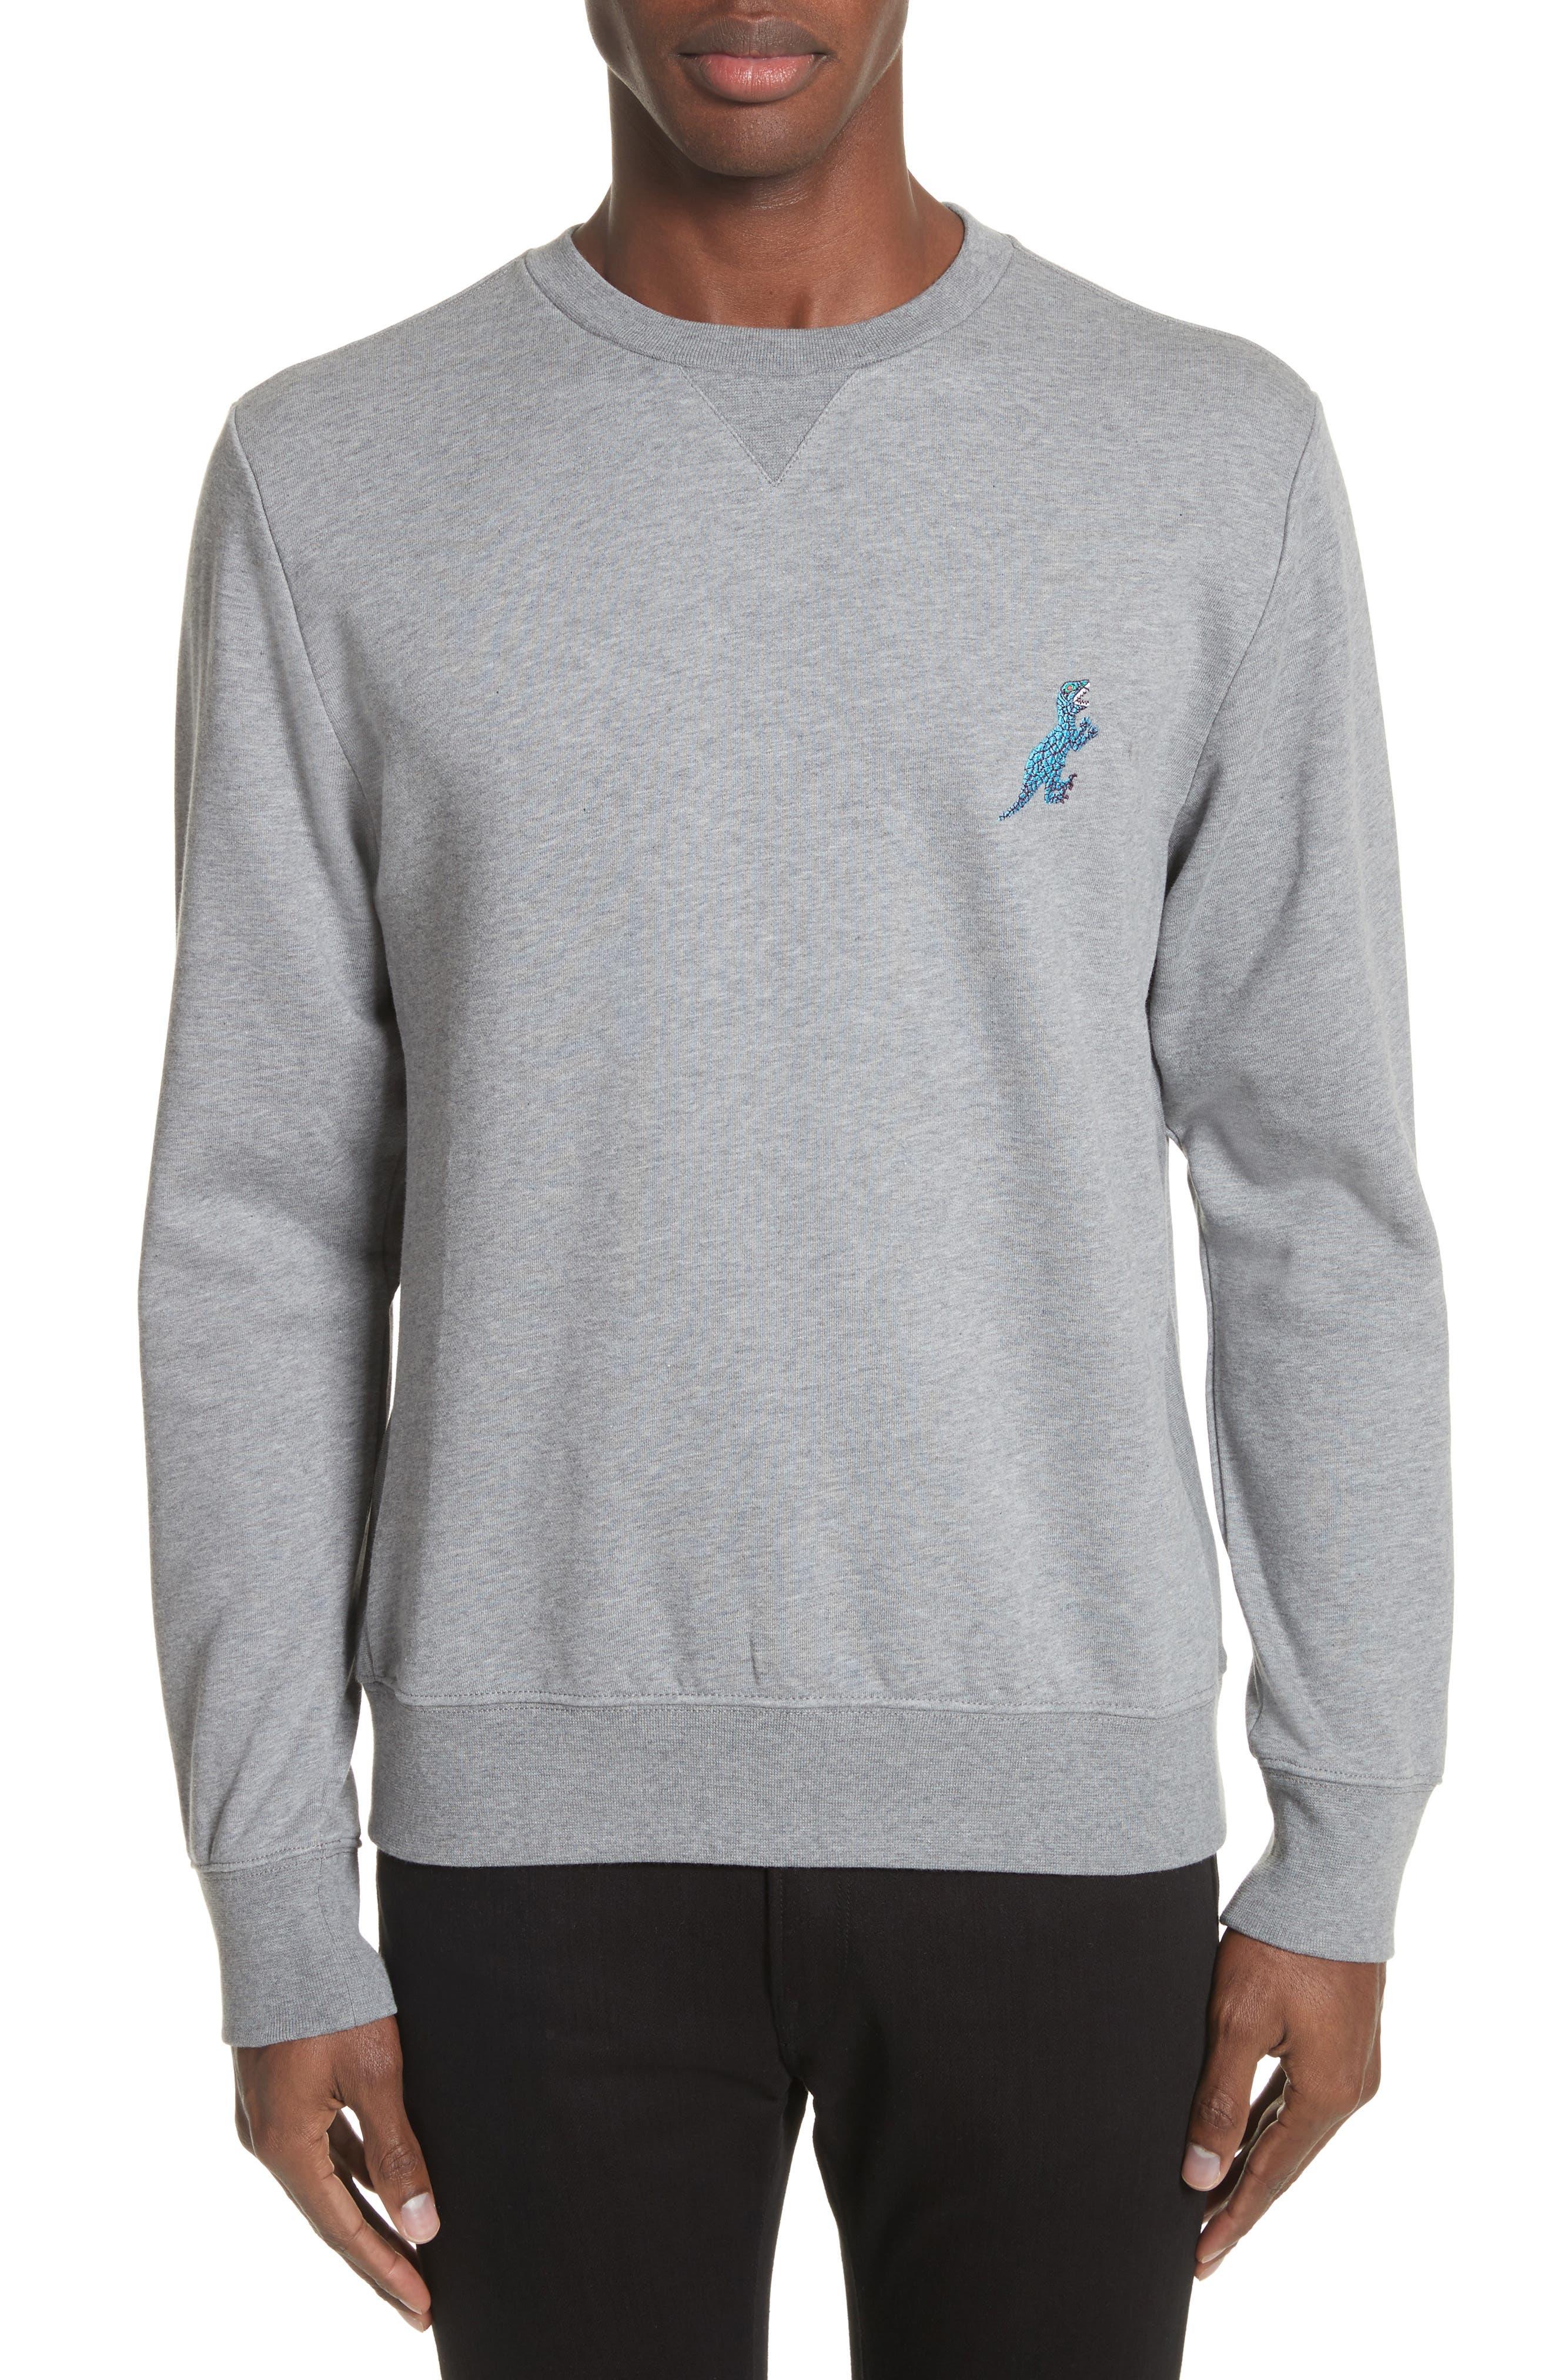 Dino Embroidered Crewneck Sweatshirt,                         Main,                         color,